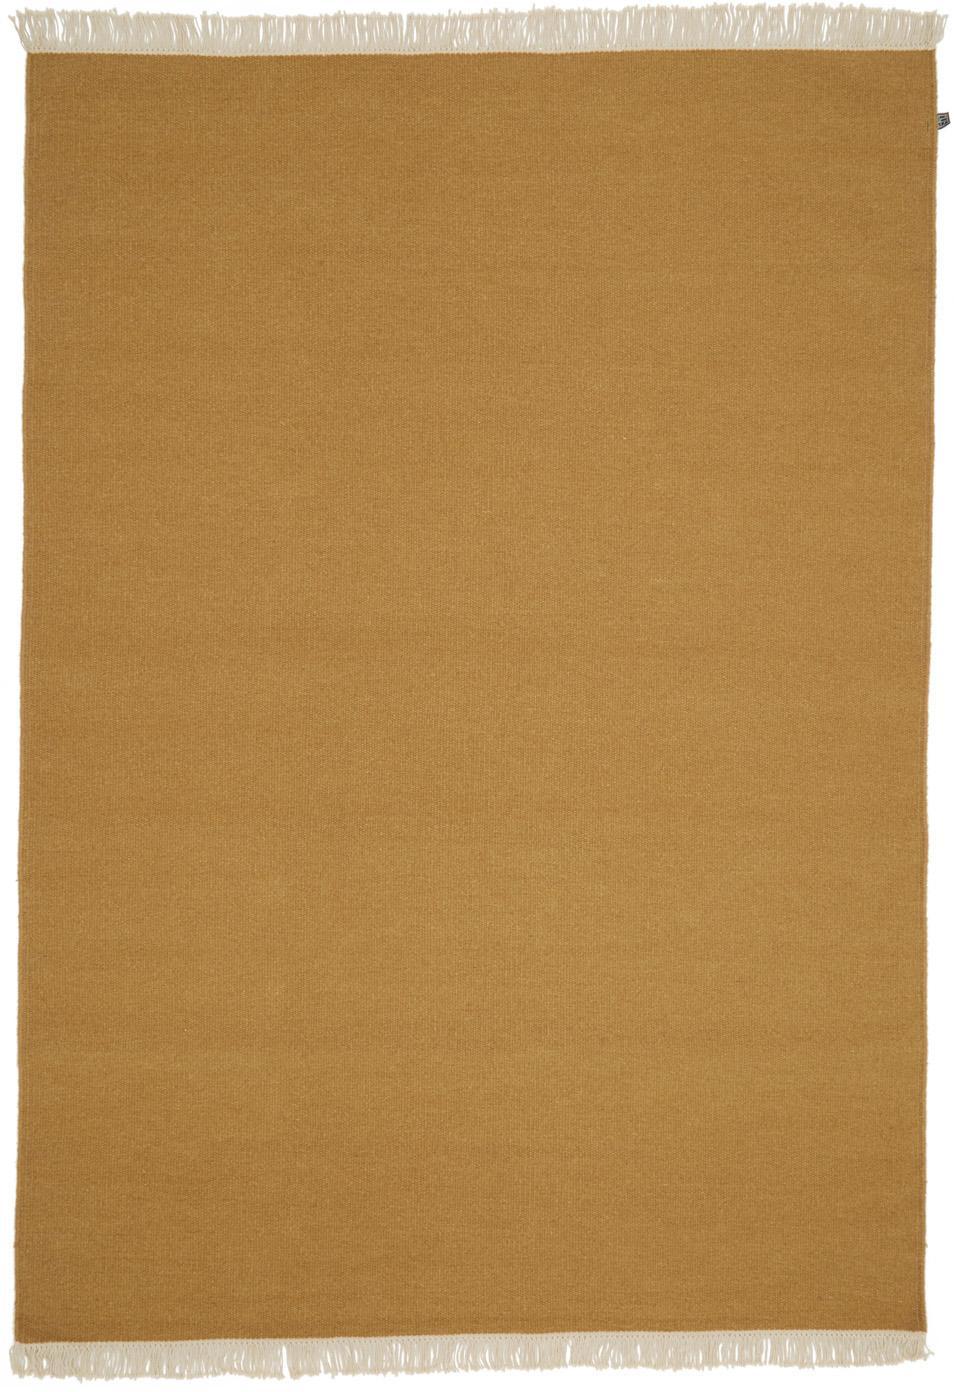 Alfombra artesanal de lana con flecos Rainbow, Flecos: 100%algodón, Ocre, An 140 x L 200  cm(Tamaño S)